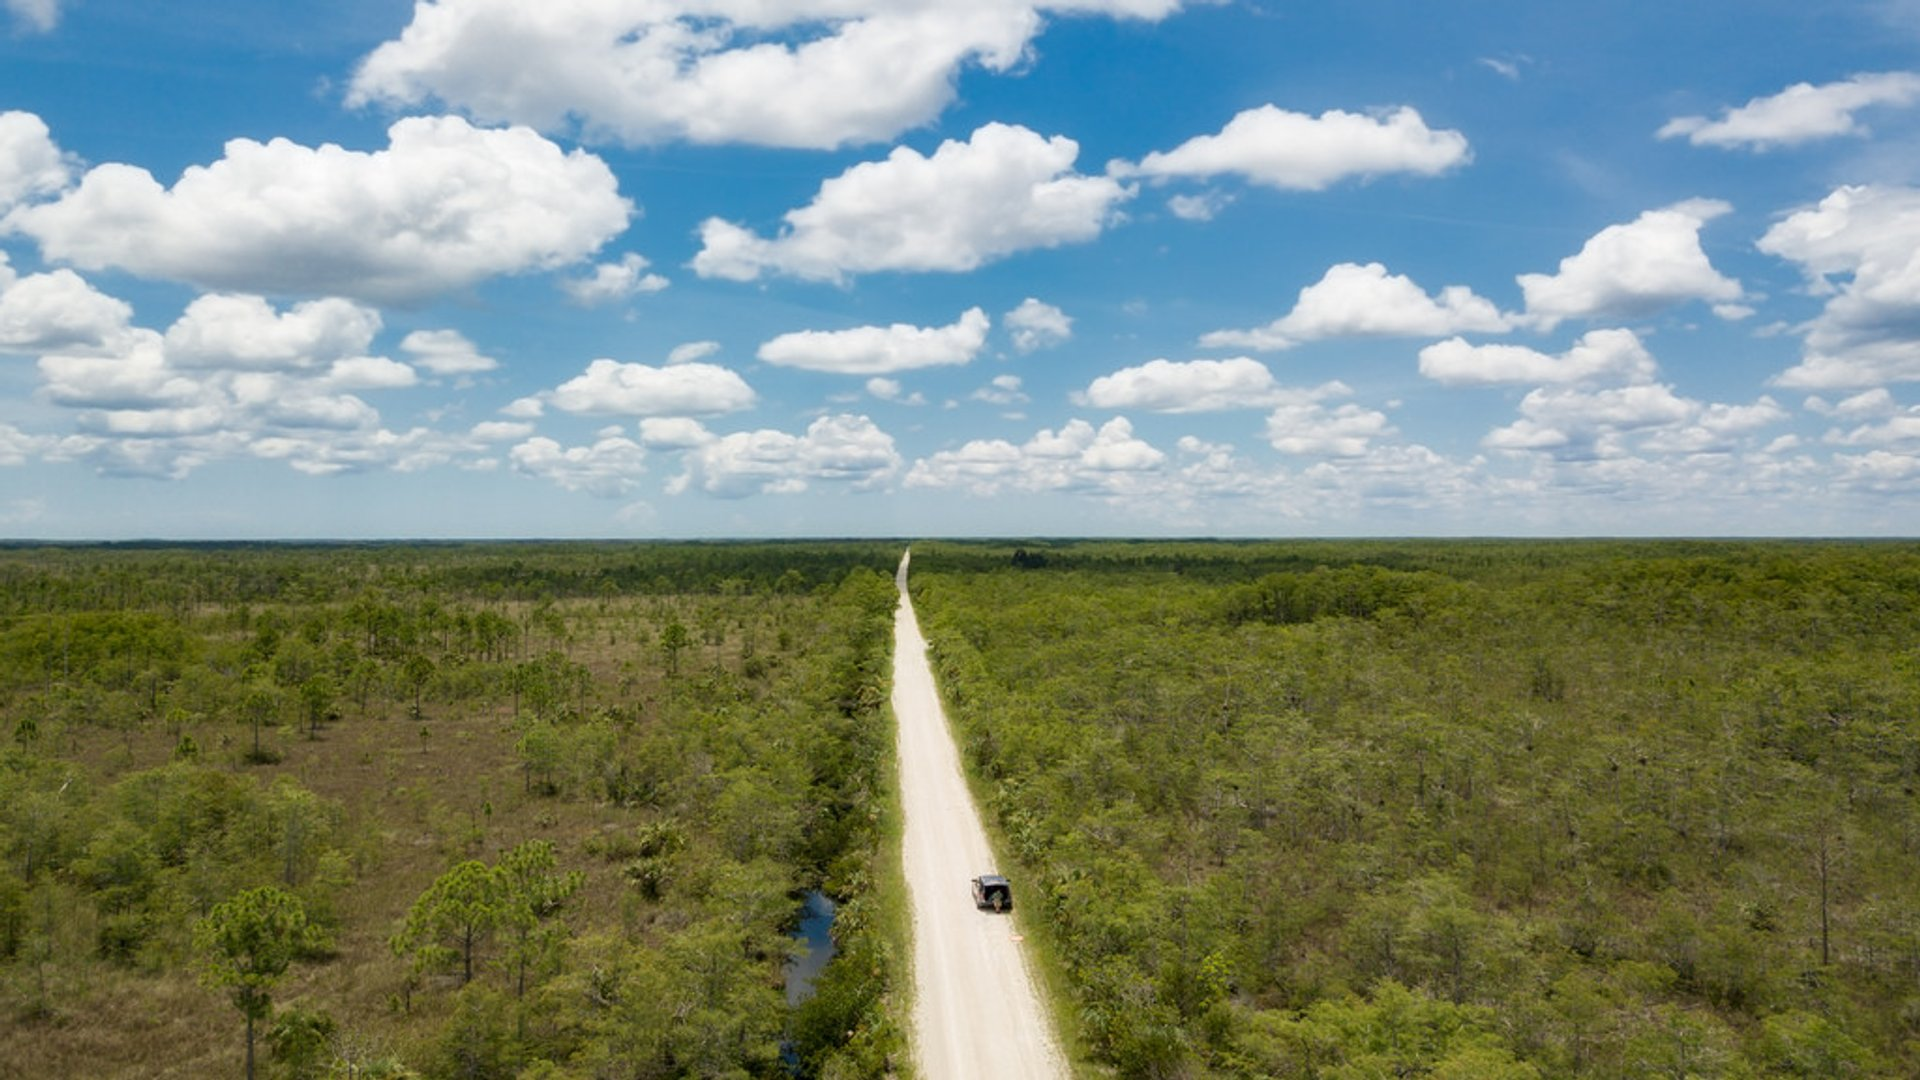 Loop Road Scenic Drive in Florida - Best Season 2020